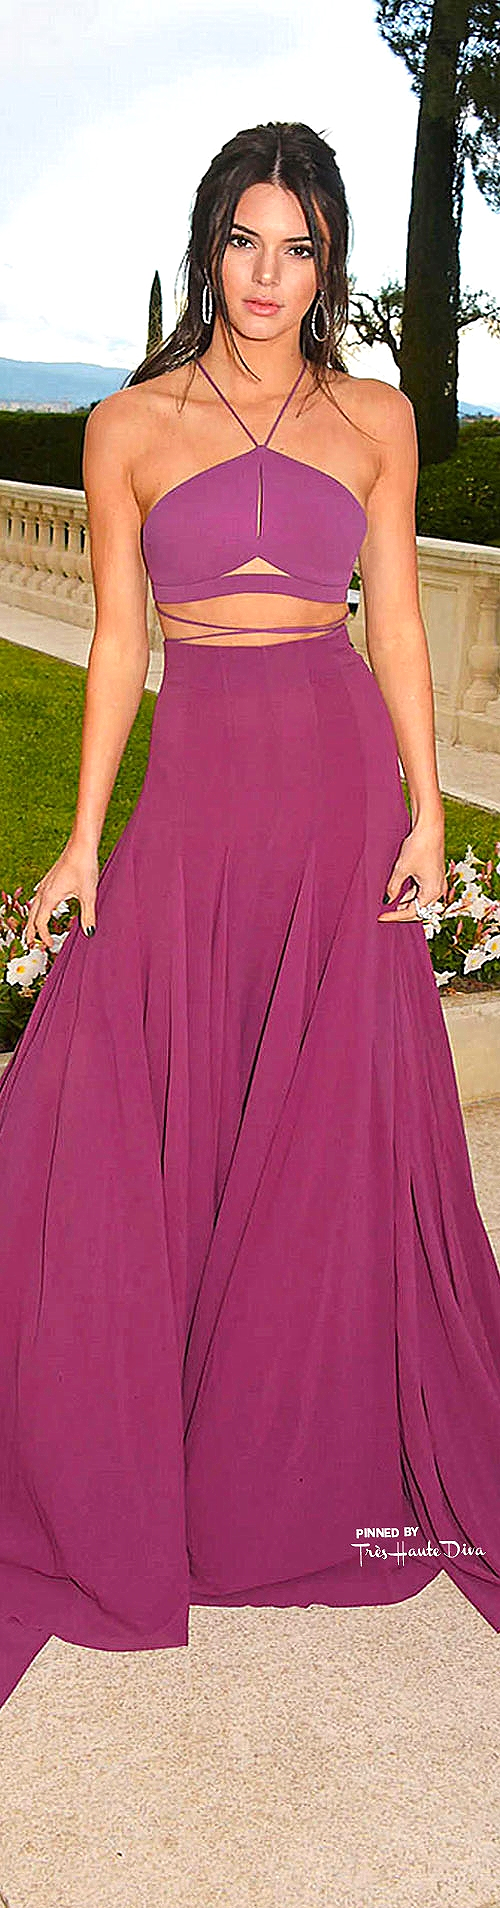 vestido frente unica #halter neck dress # vestido festa #gown ...